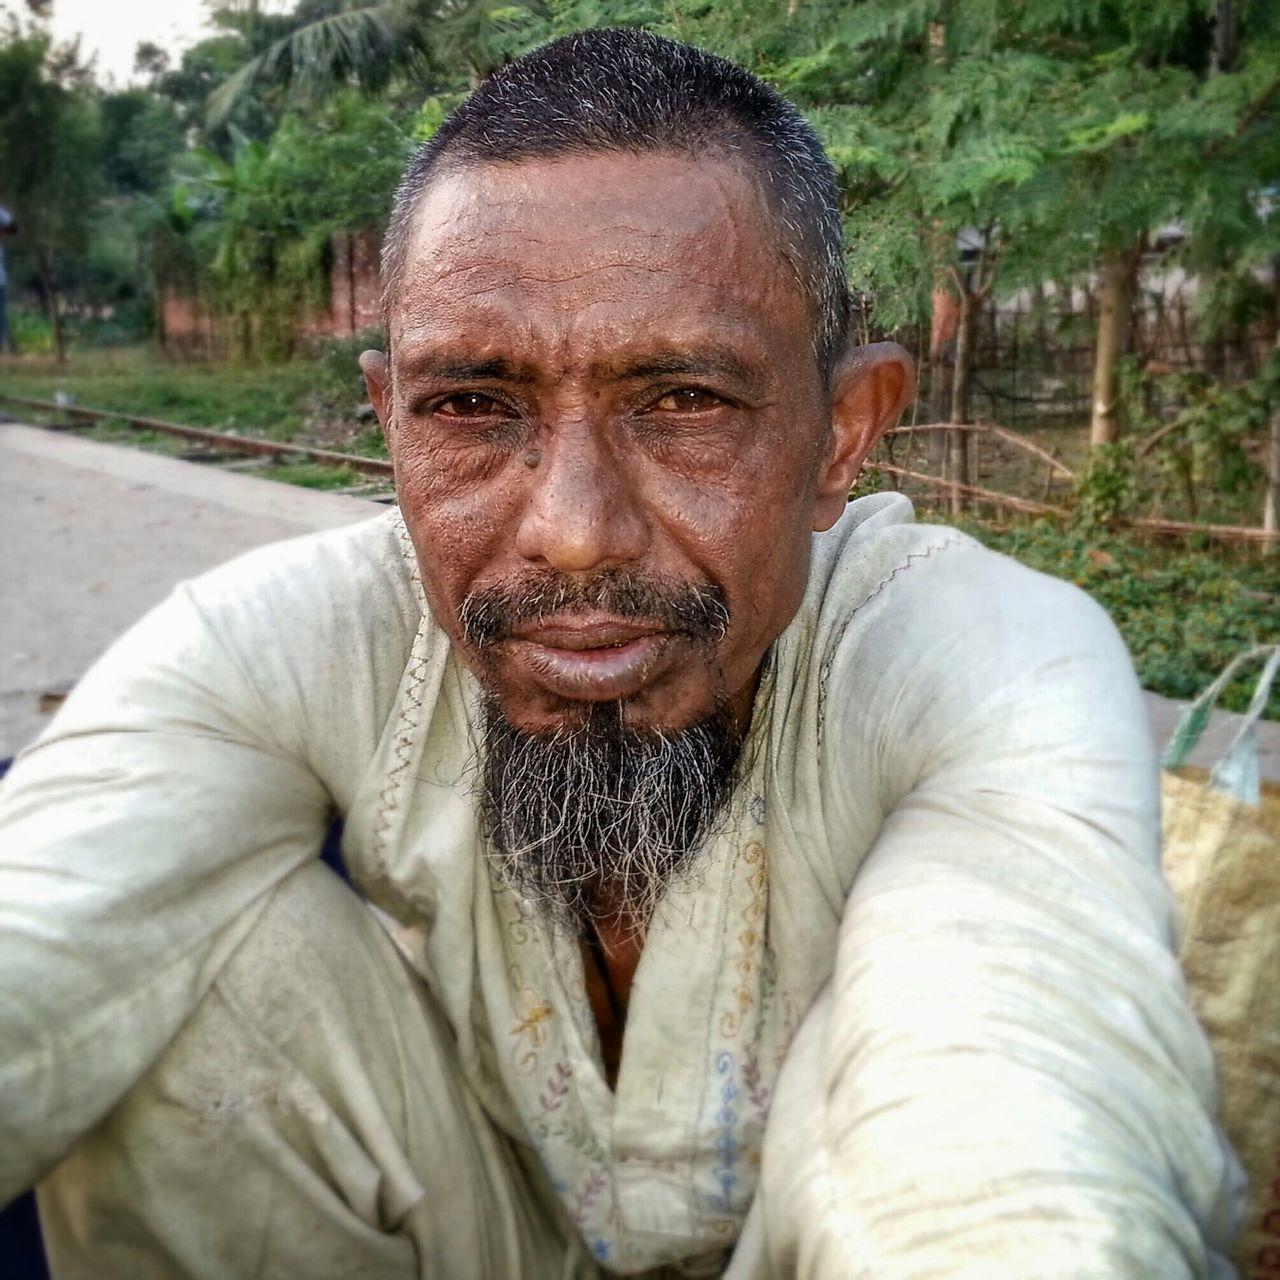 Oldman Jessore Street Photography Portrait EyeEm Best Shots People Of Bangladesh Smiling Strangers Faces Of EyeEm Bangladesh Streetlife